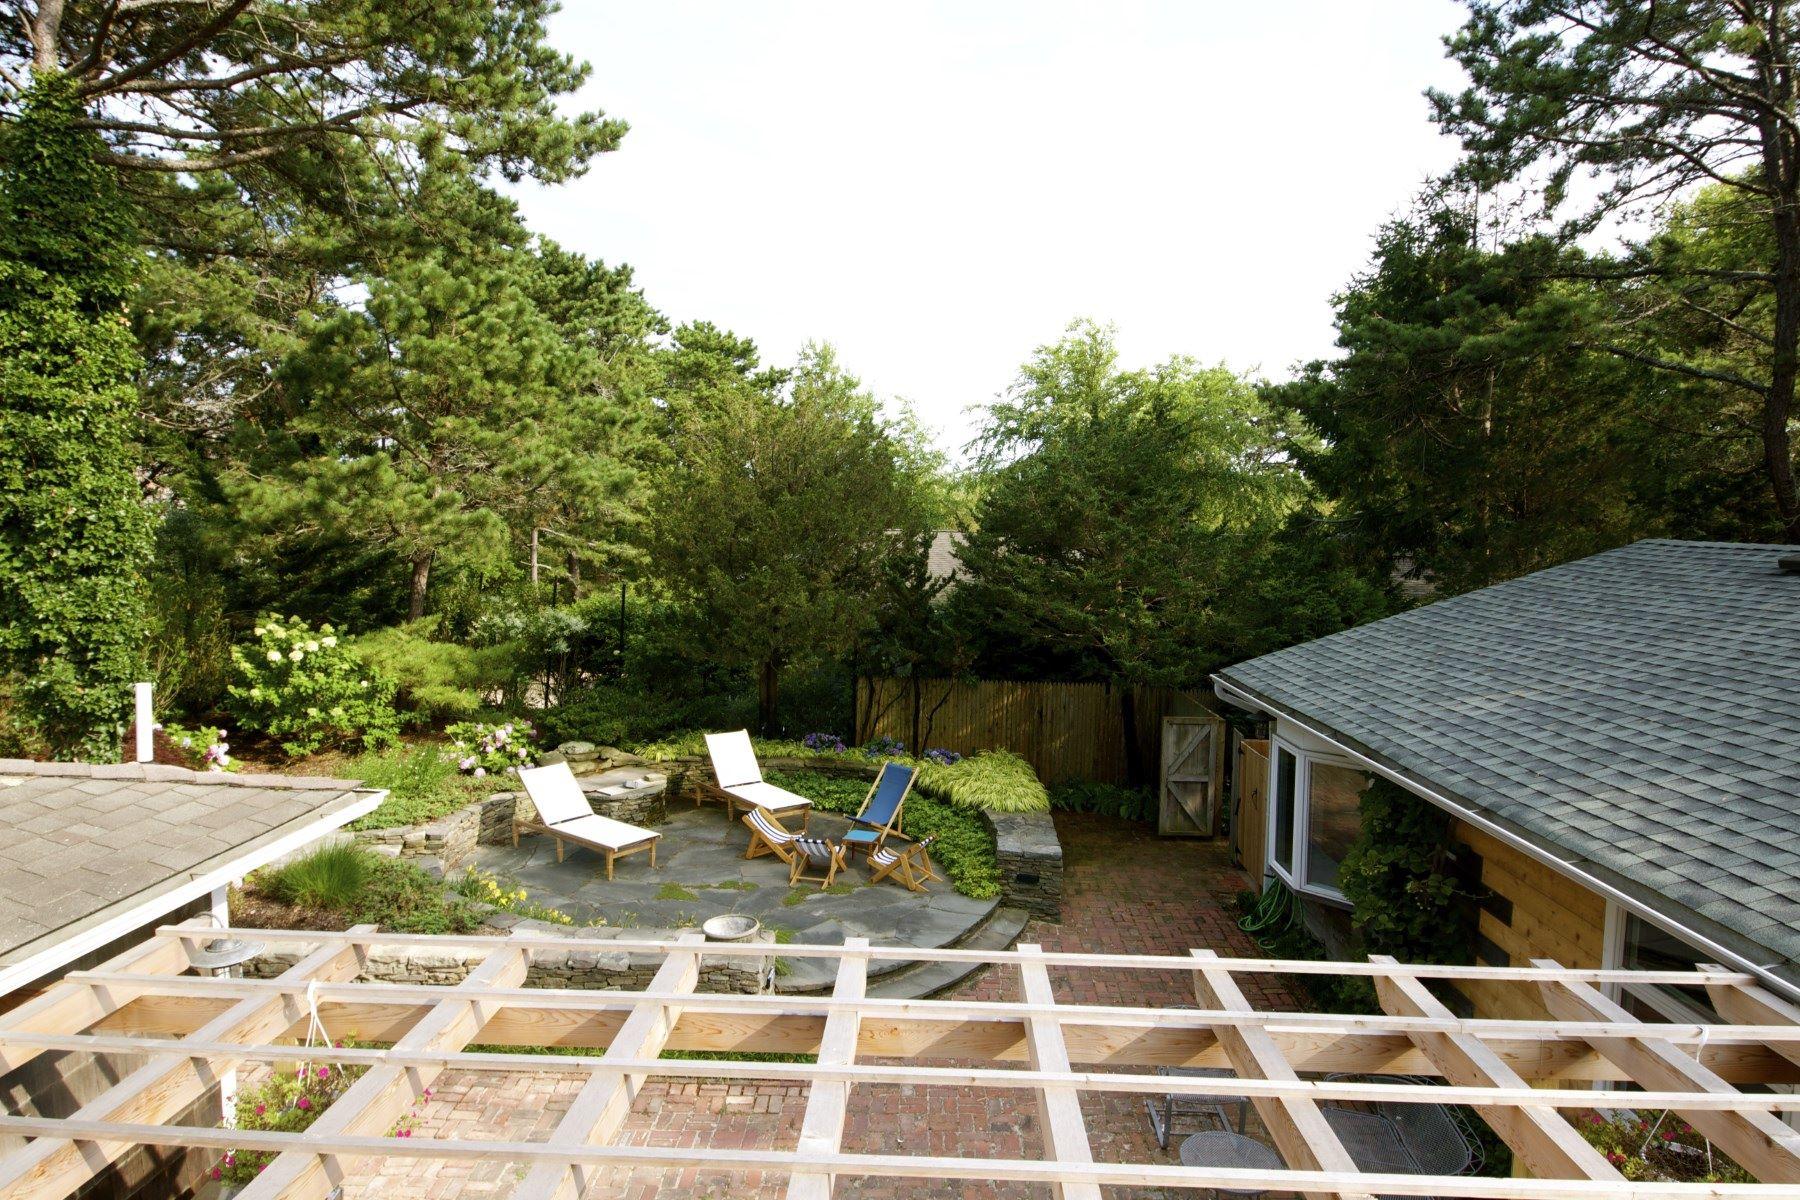 Additional photo for property listing at Amagansett Dunes Beach House 41 Hampton Lane Amagansett, New York 11930 United States